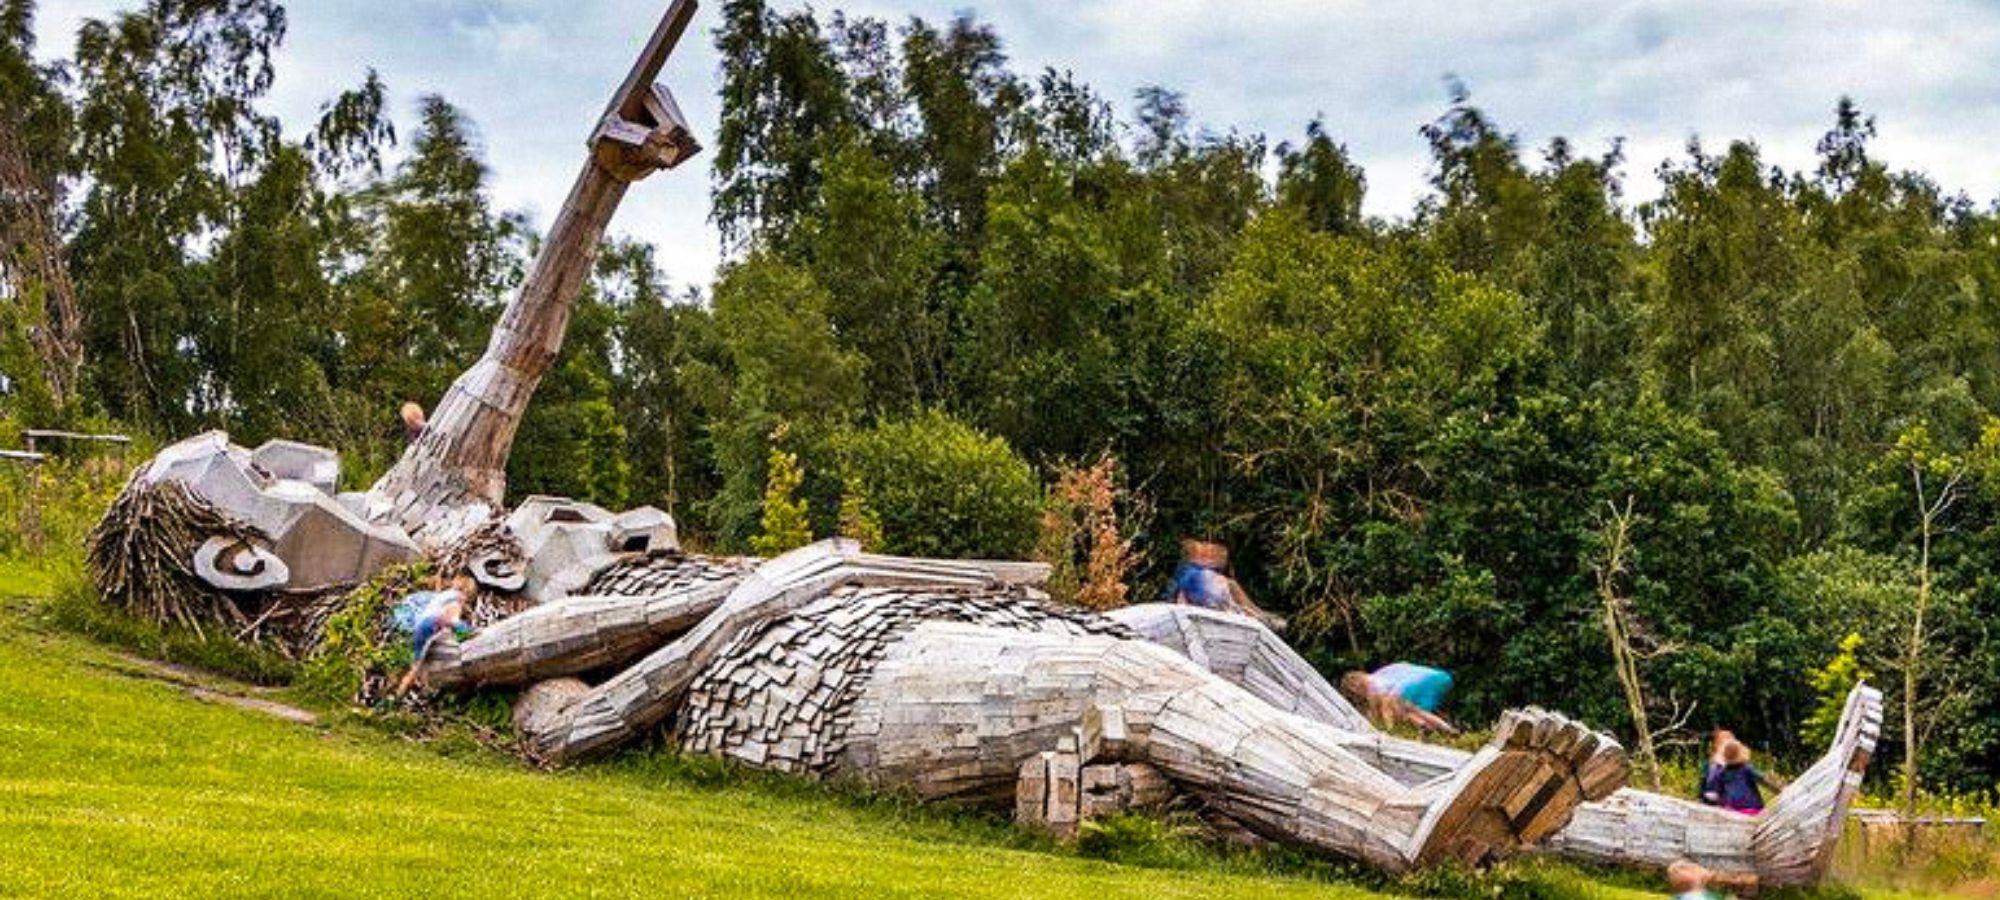 Two wooden troll sculptures lying down on the grass in De Schorre park, Antwerp